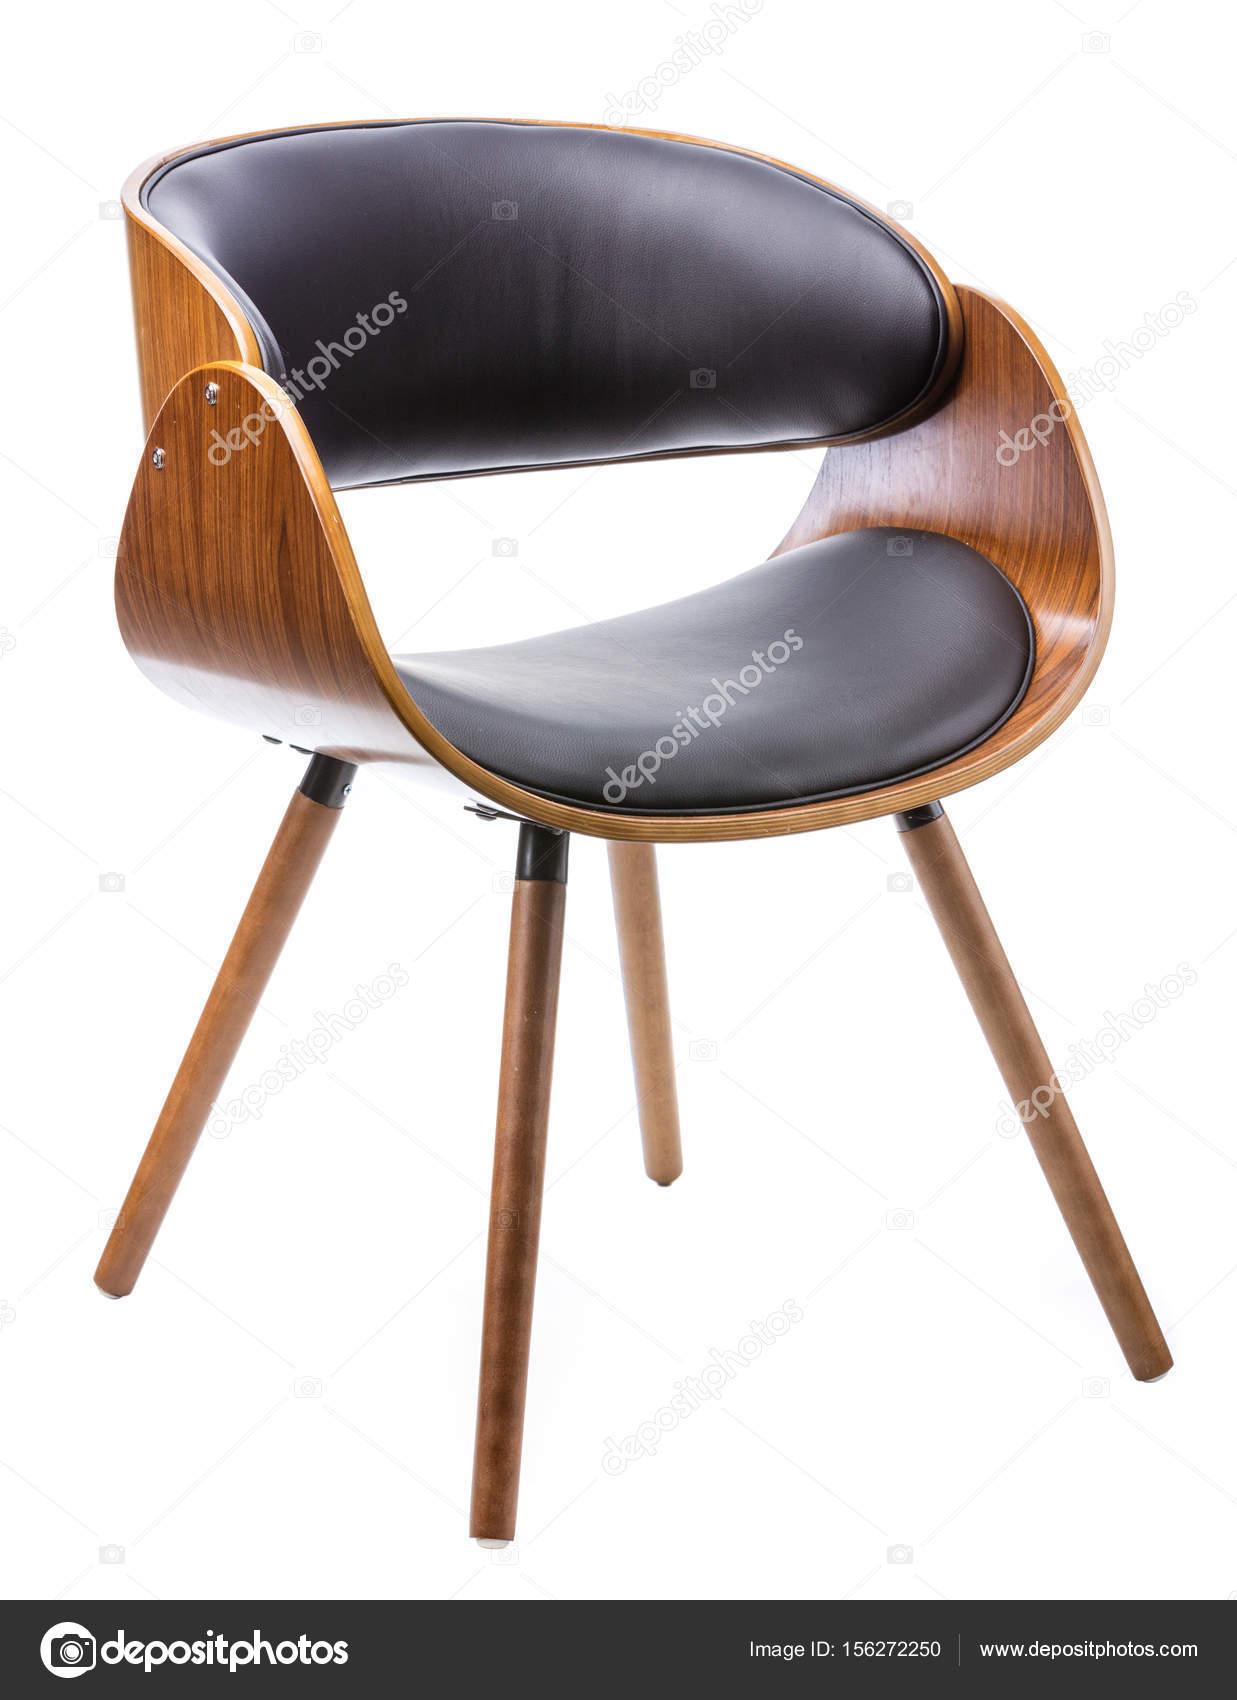 Design Holzstuhl. Affordable Large Size Of Holzstuhl Schwarz Braun ...